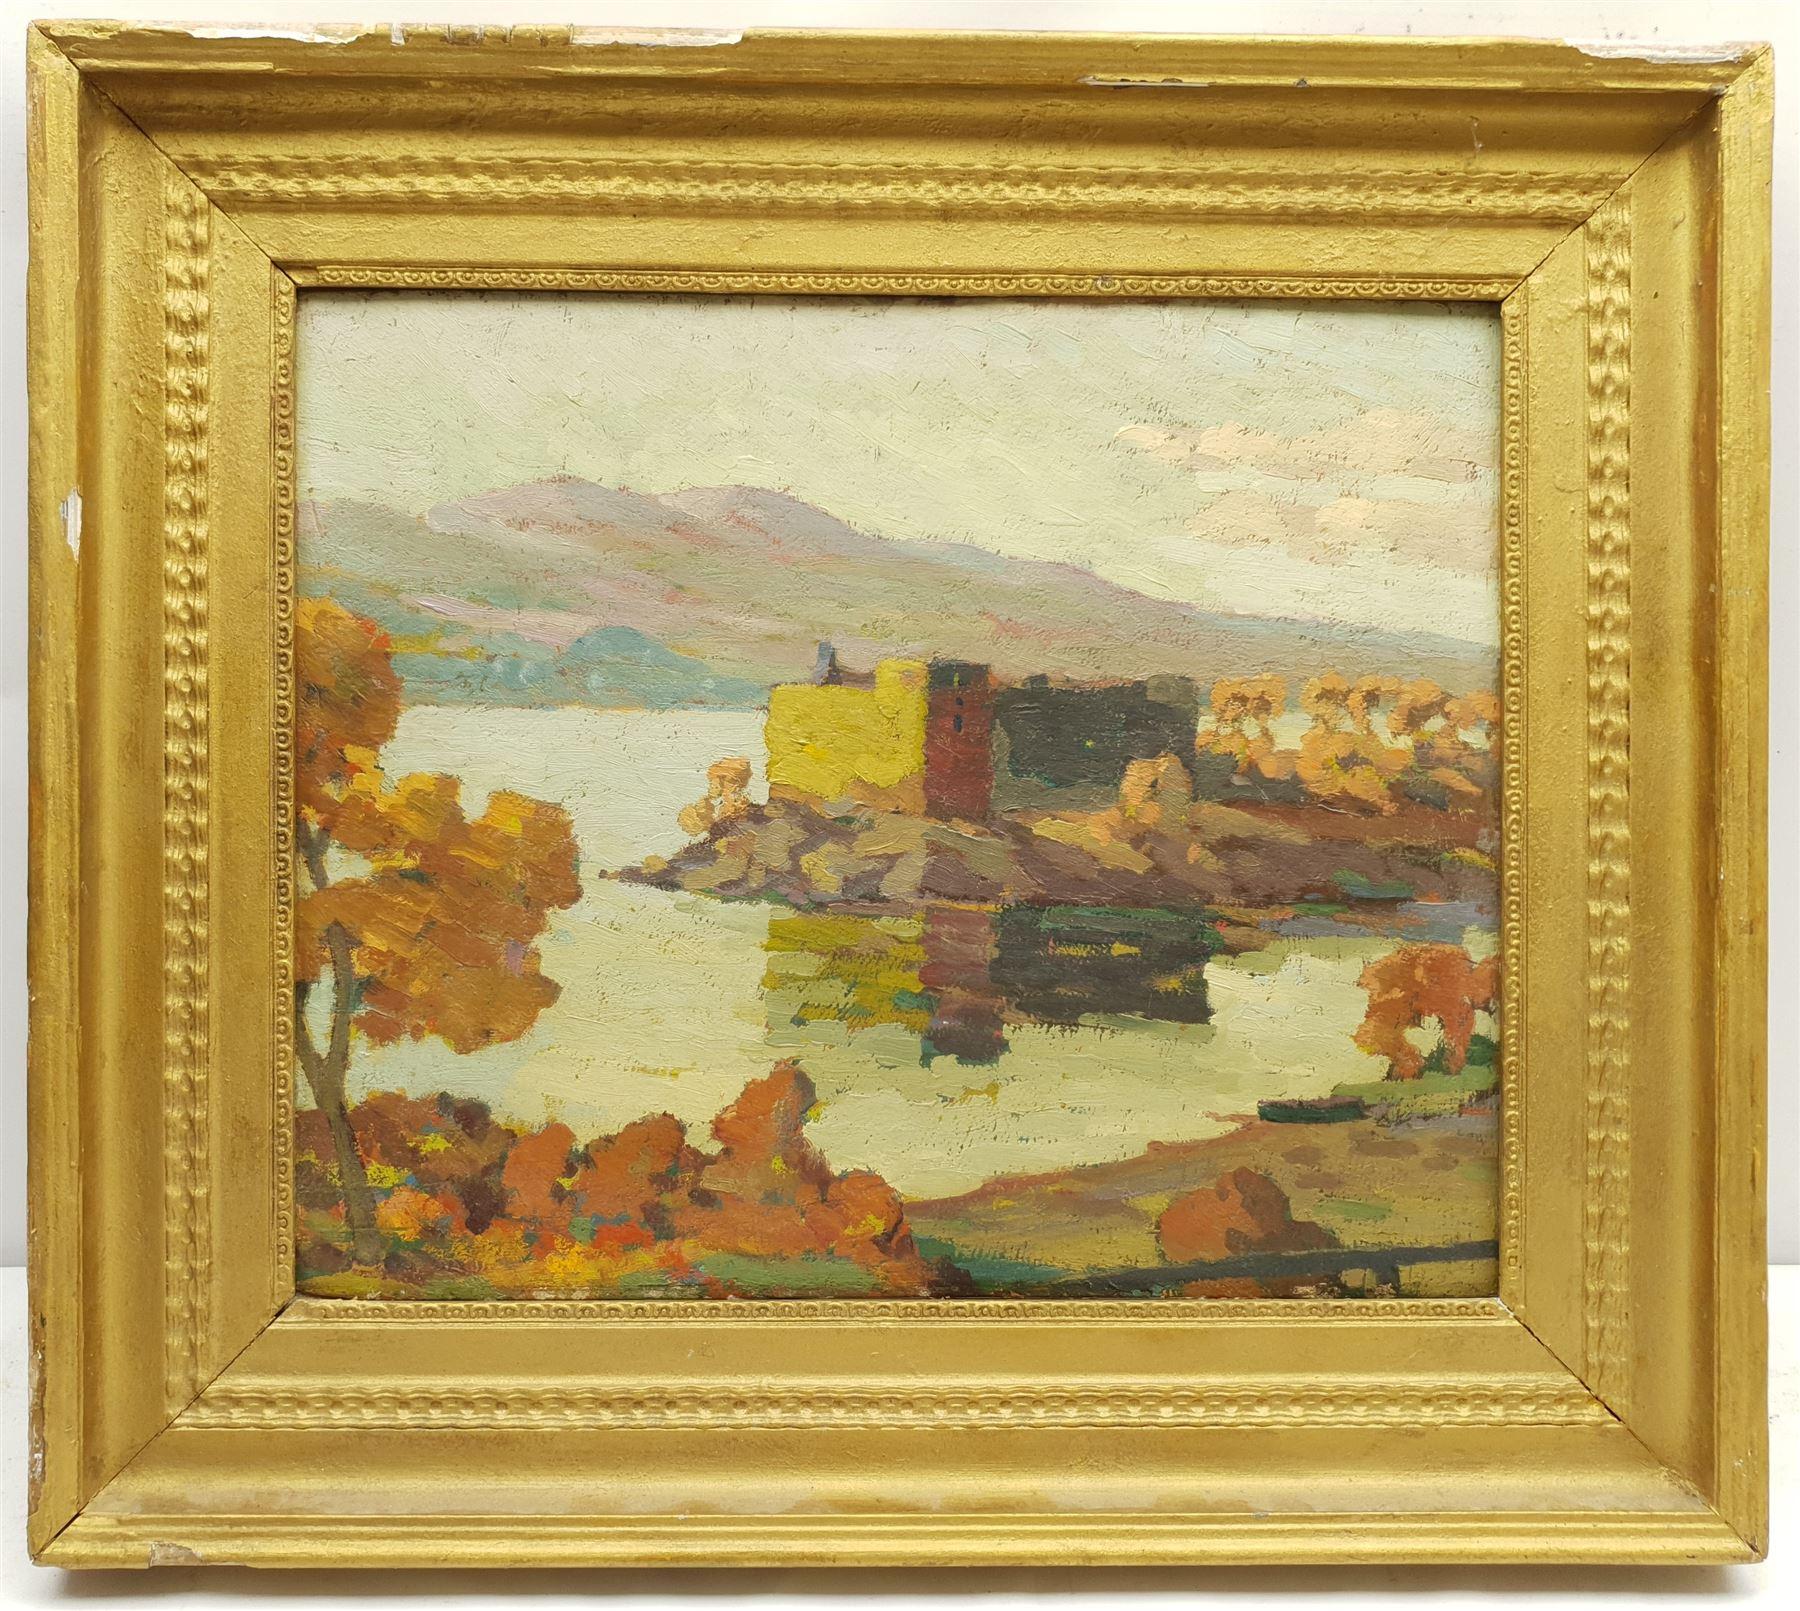 Scottish School (Early 20th century): Loch Scene with Peninsular Castle - Image 2 of 3